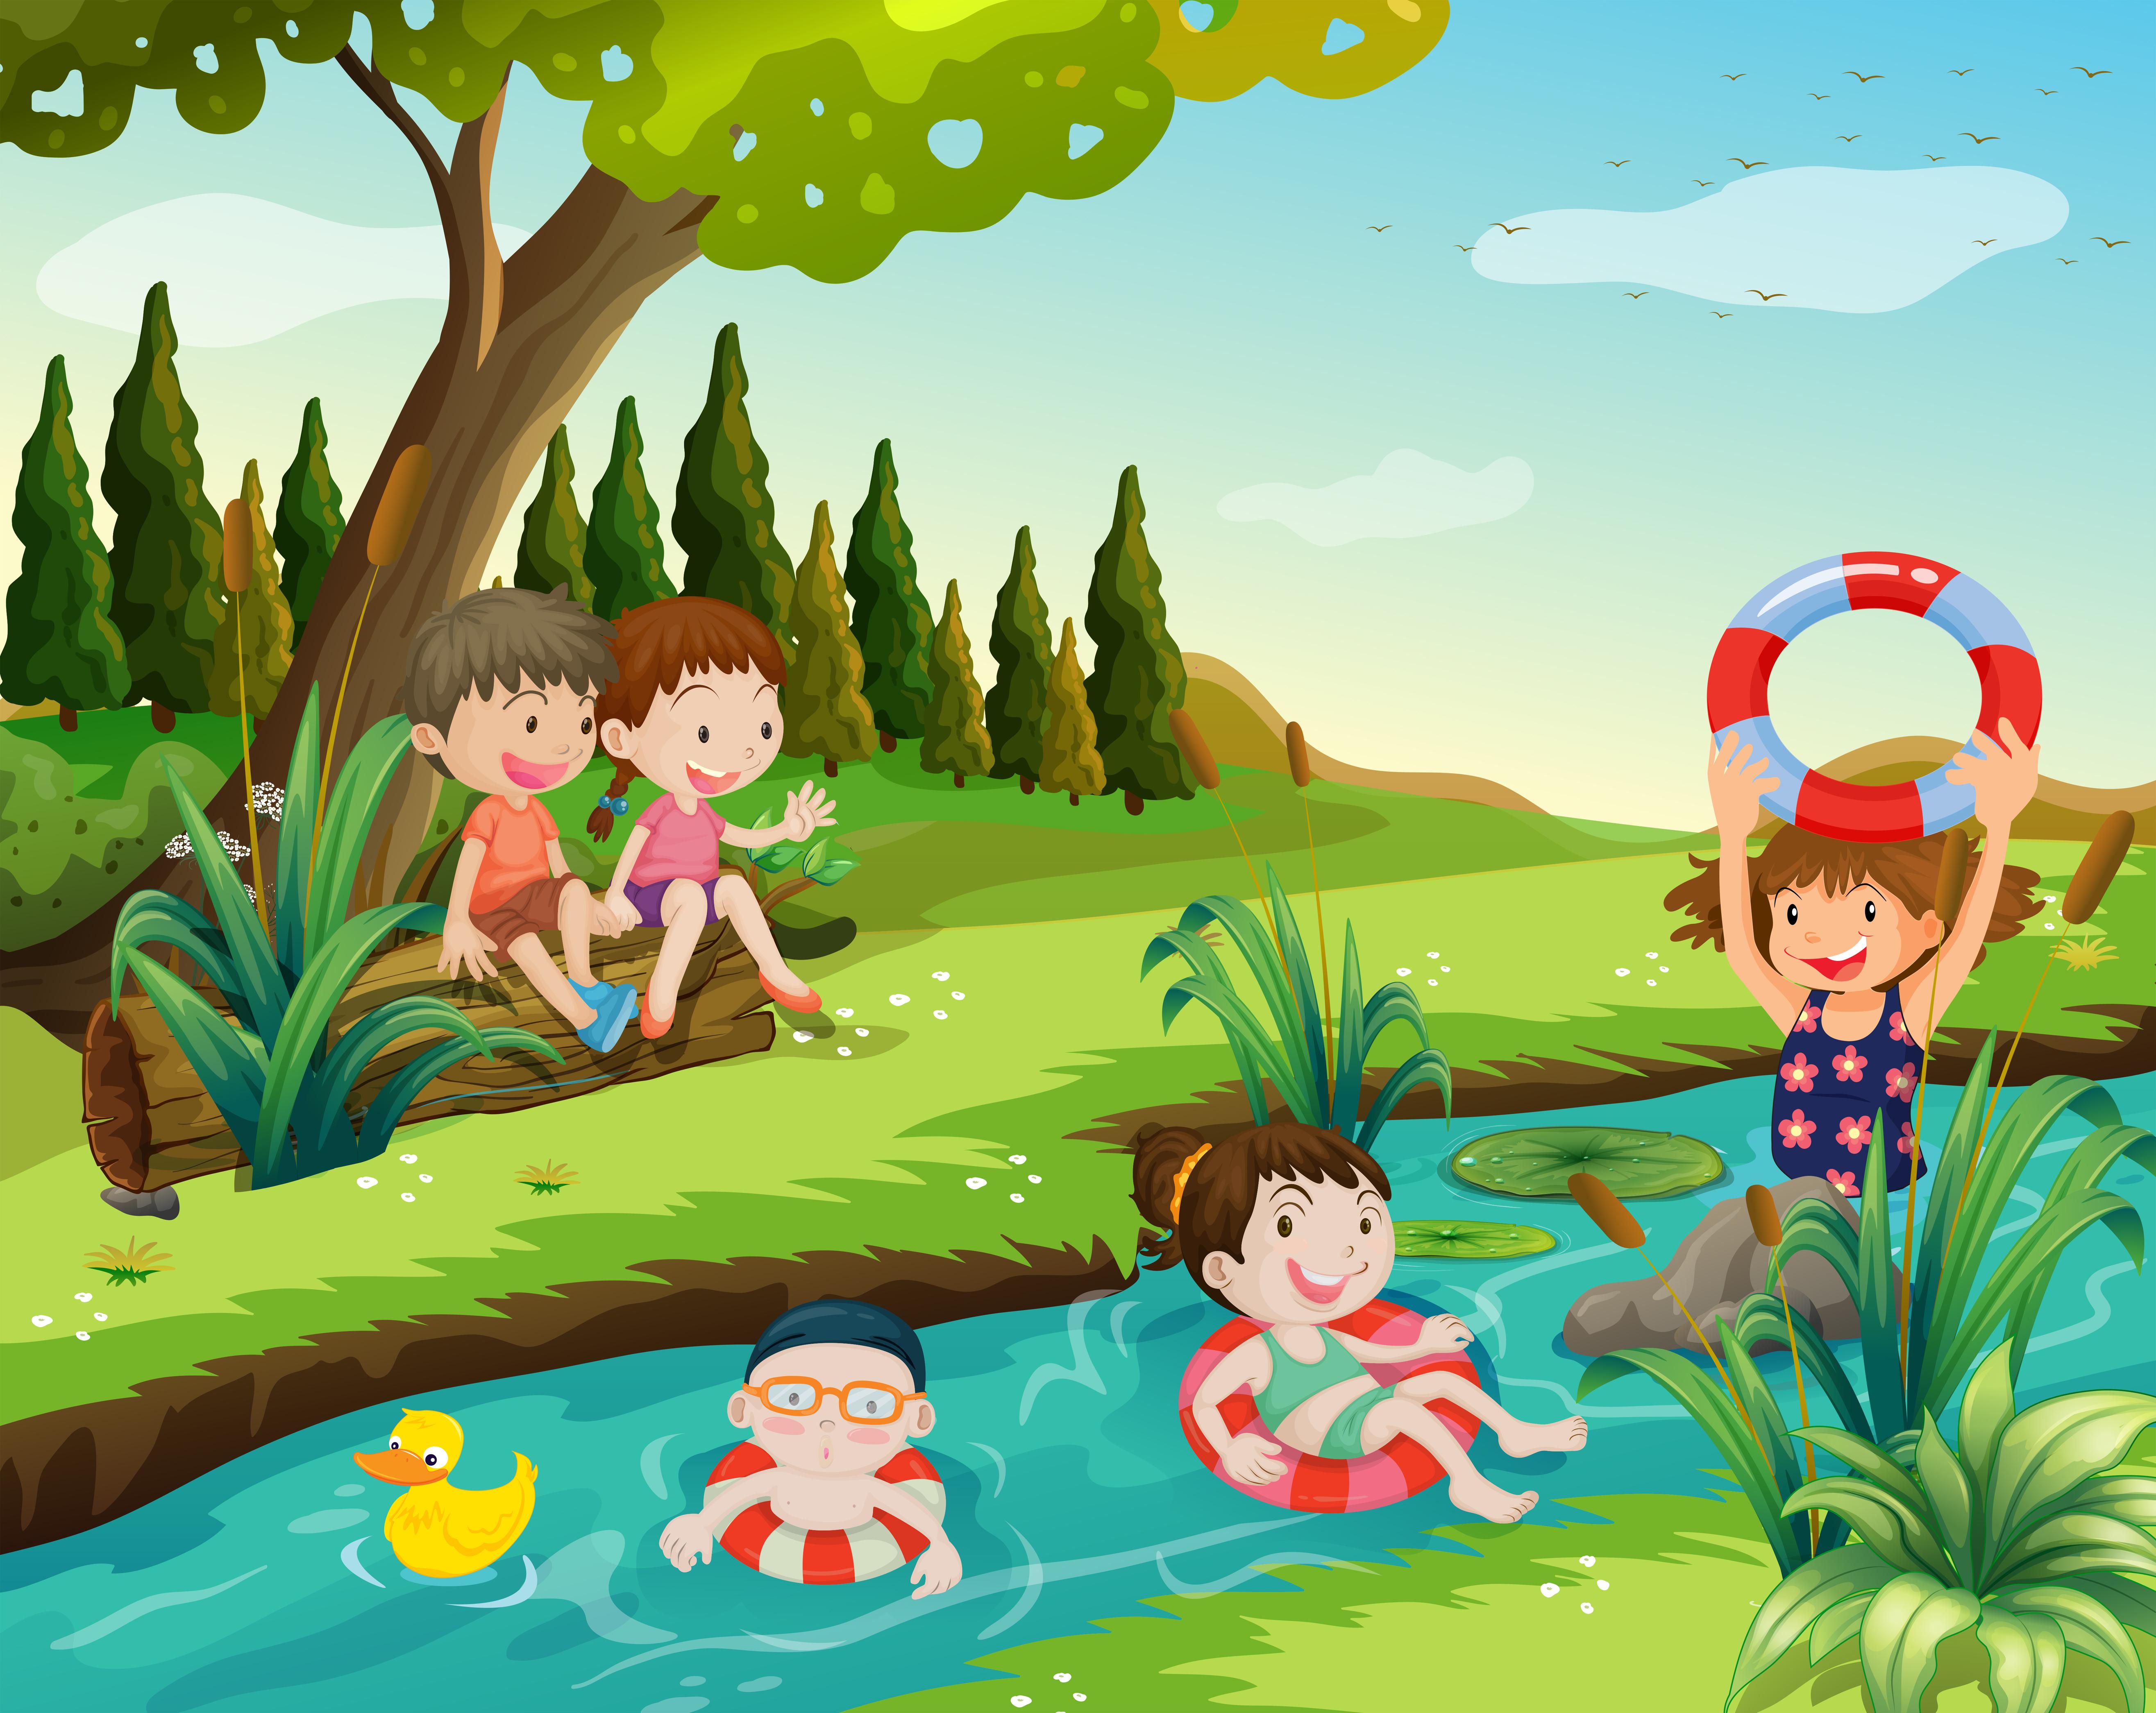 Картинки купание детей в речке